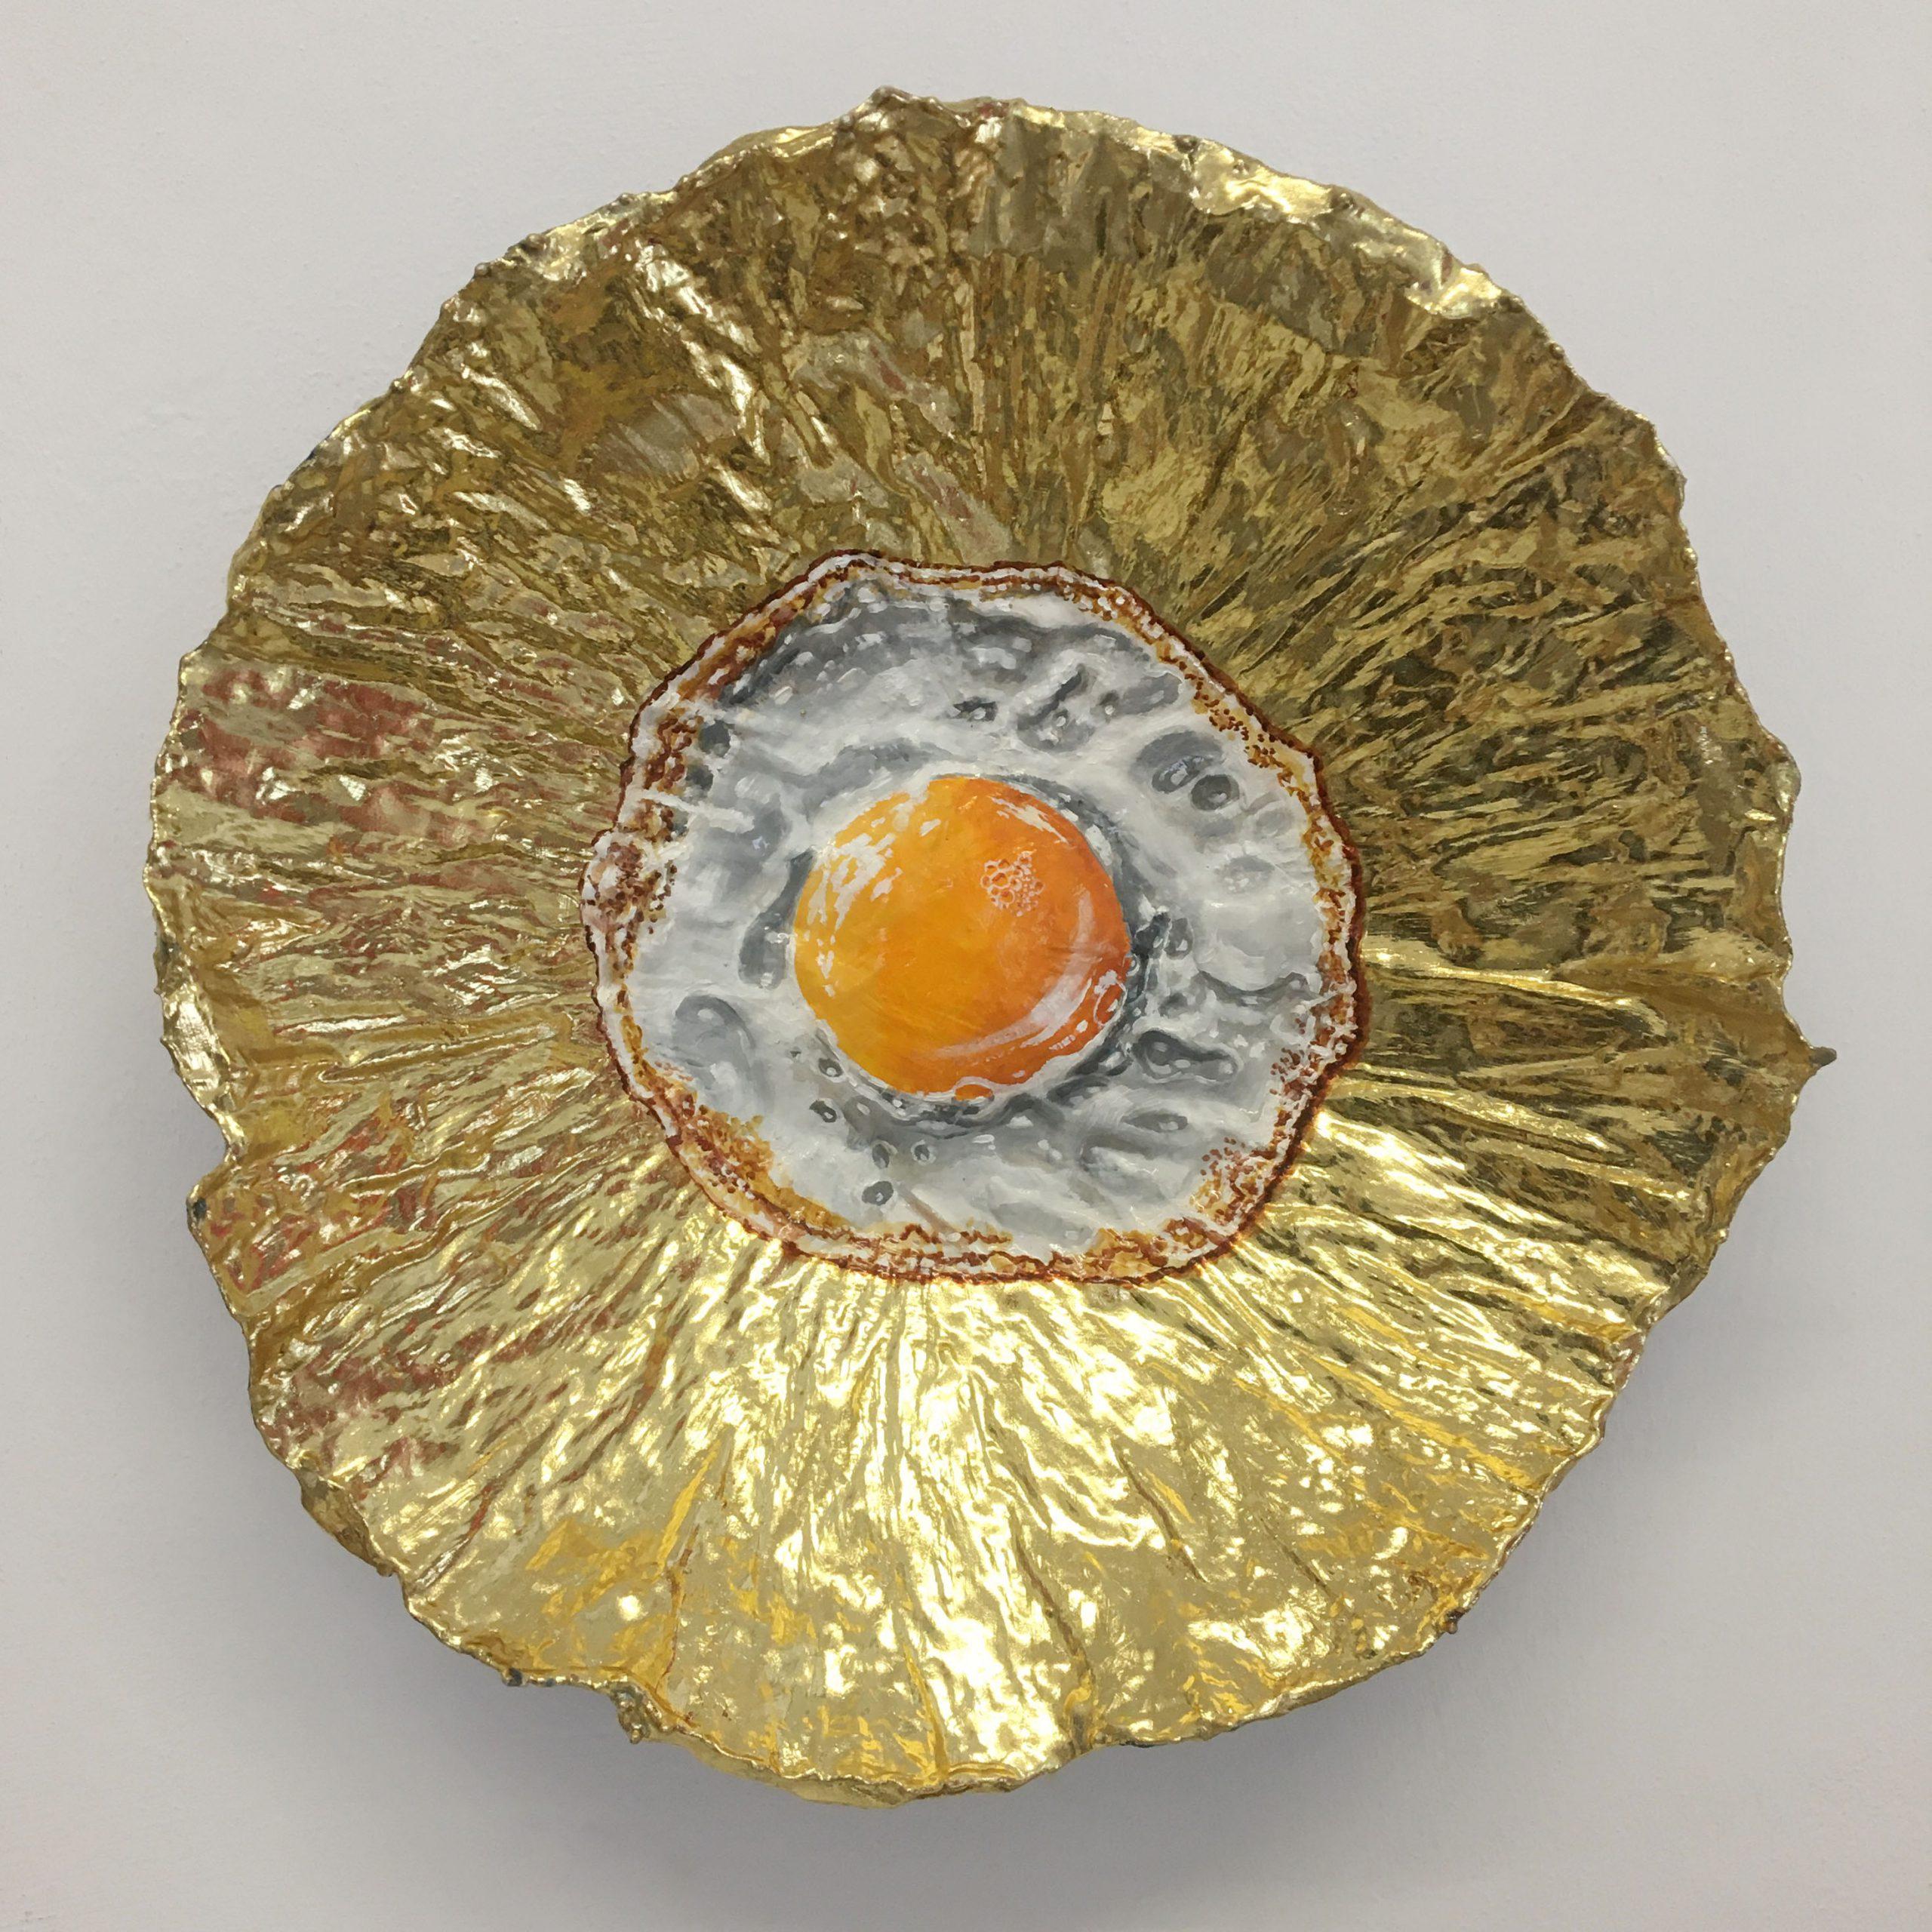 Kunst: Klein spiegelei 8 van kunstenaar Katinka Krijgsman